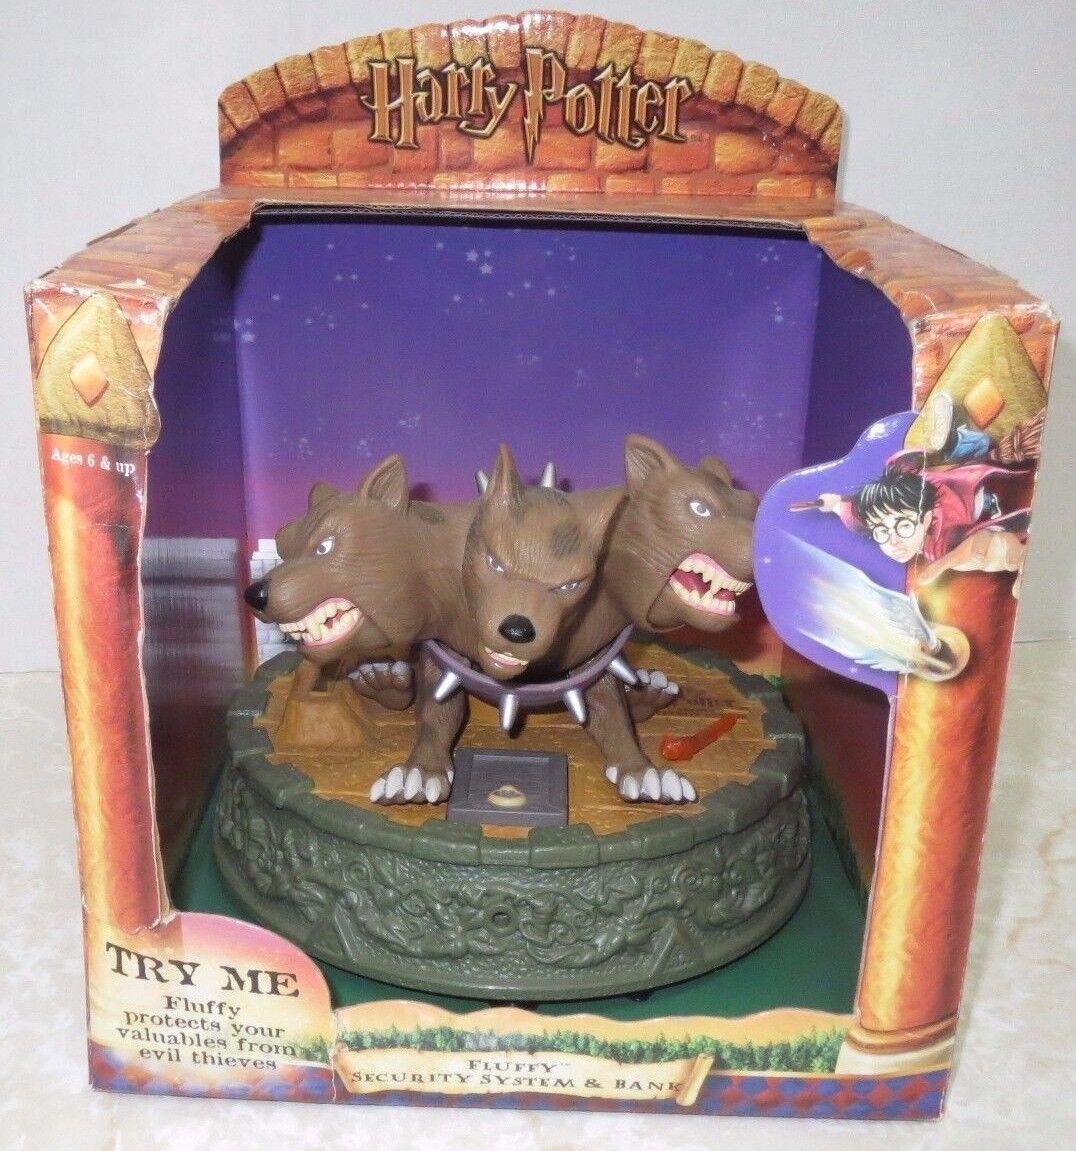 Harry Potter Potter Potter Fluffy Security System Bank Toy Figure Room Alarm Tiger Hasbro 7a52ec